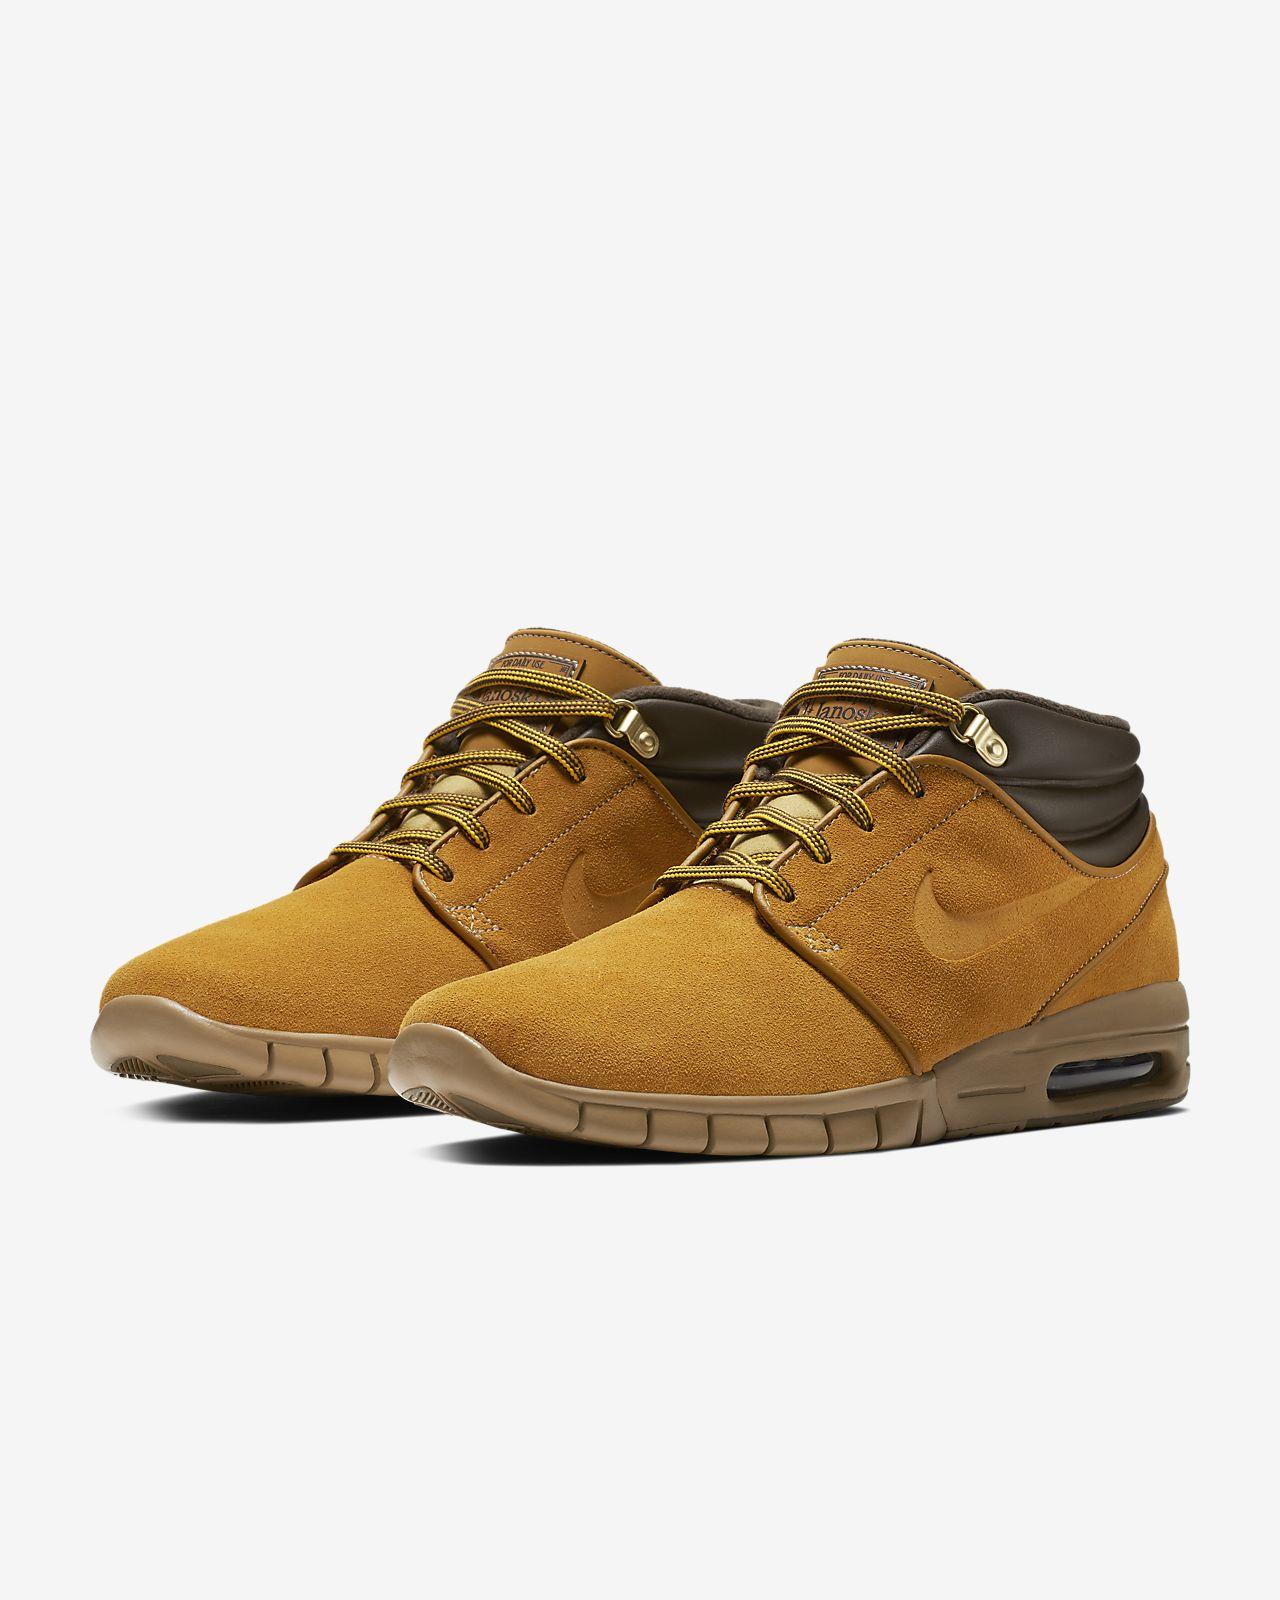 cf08d9ee421 ... Nike SB Stefan Janoski Max Mid Premium Men s Skateboarding Shoe